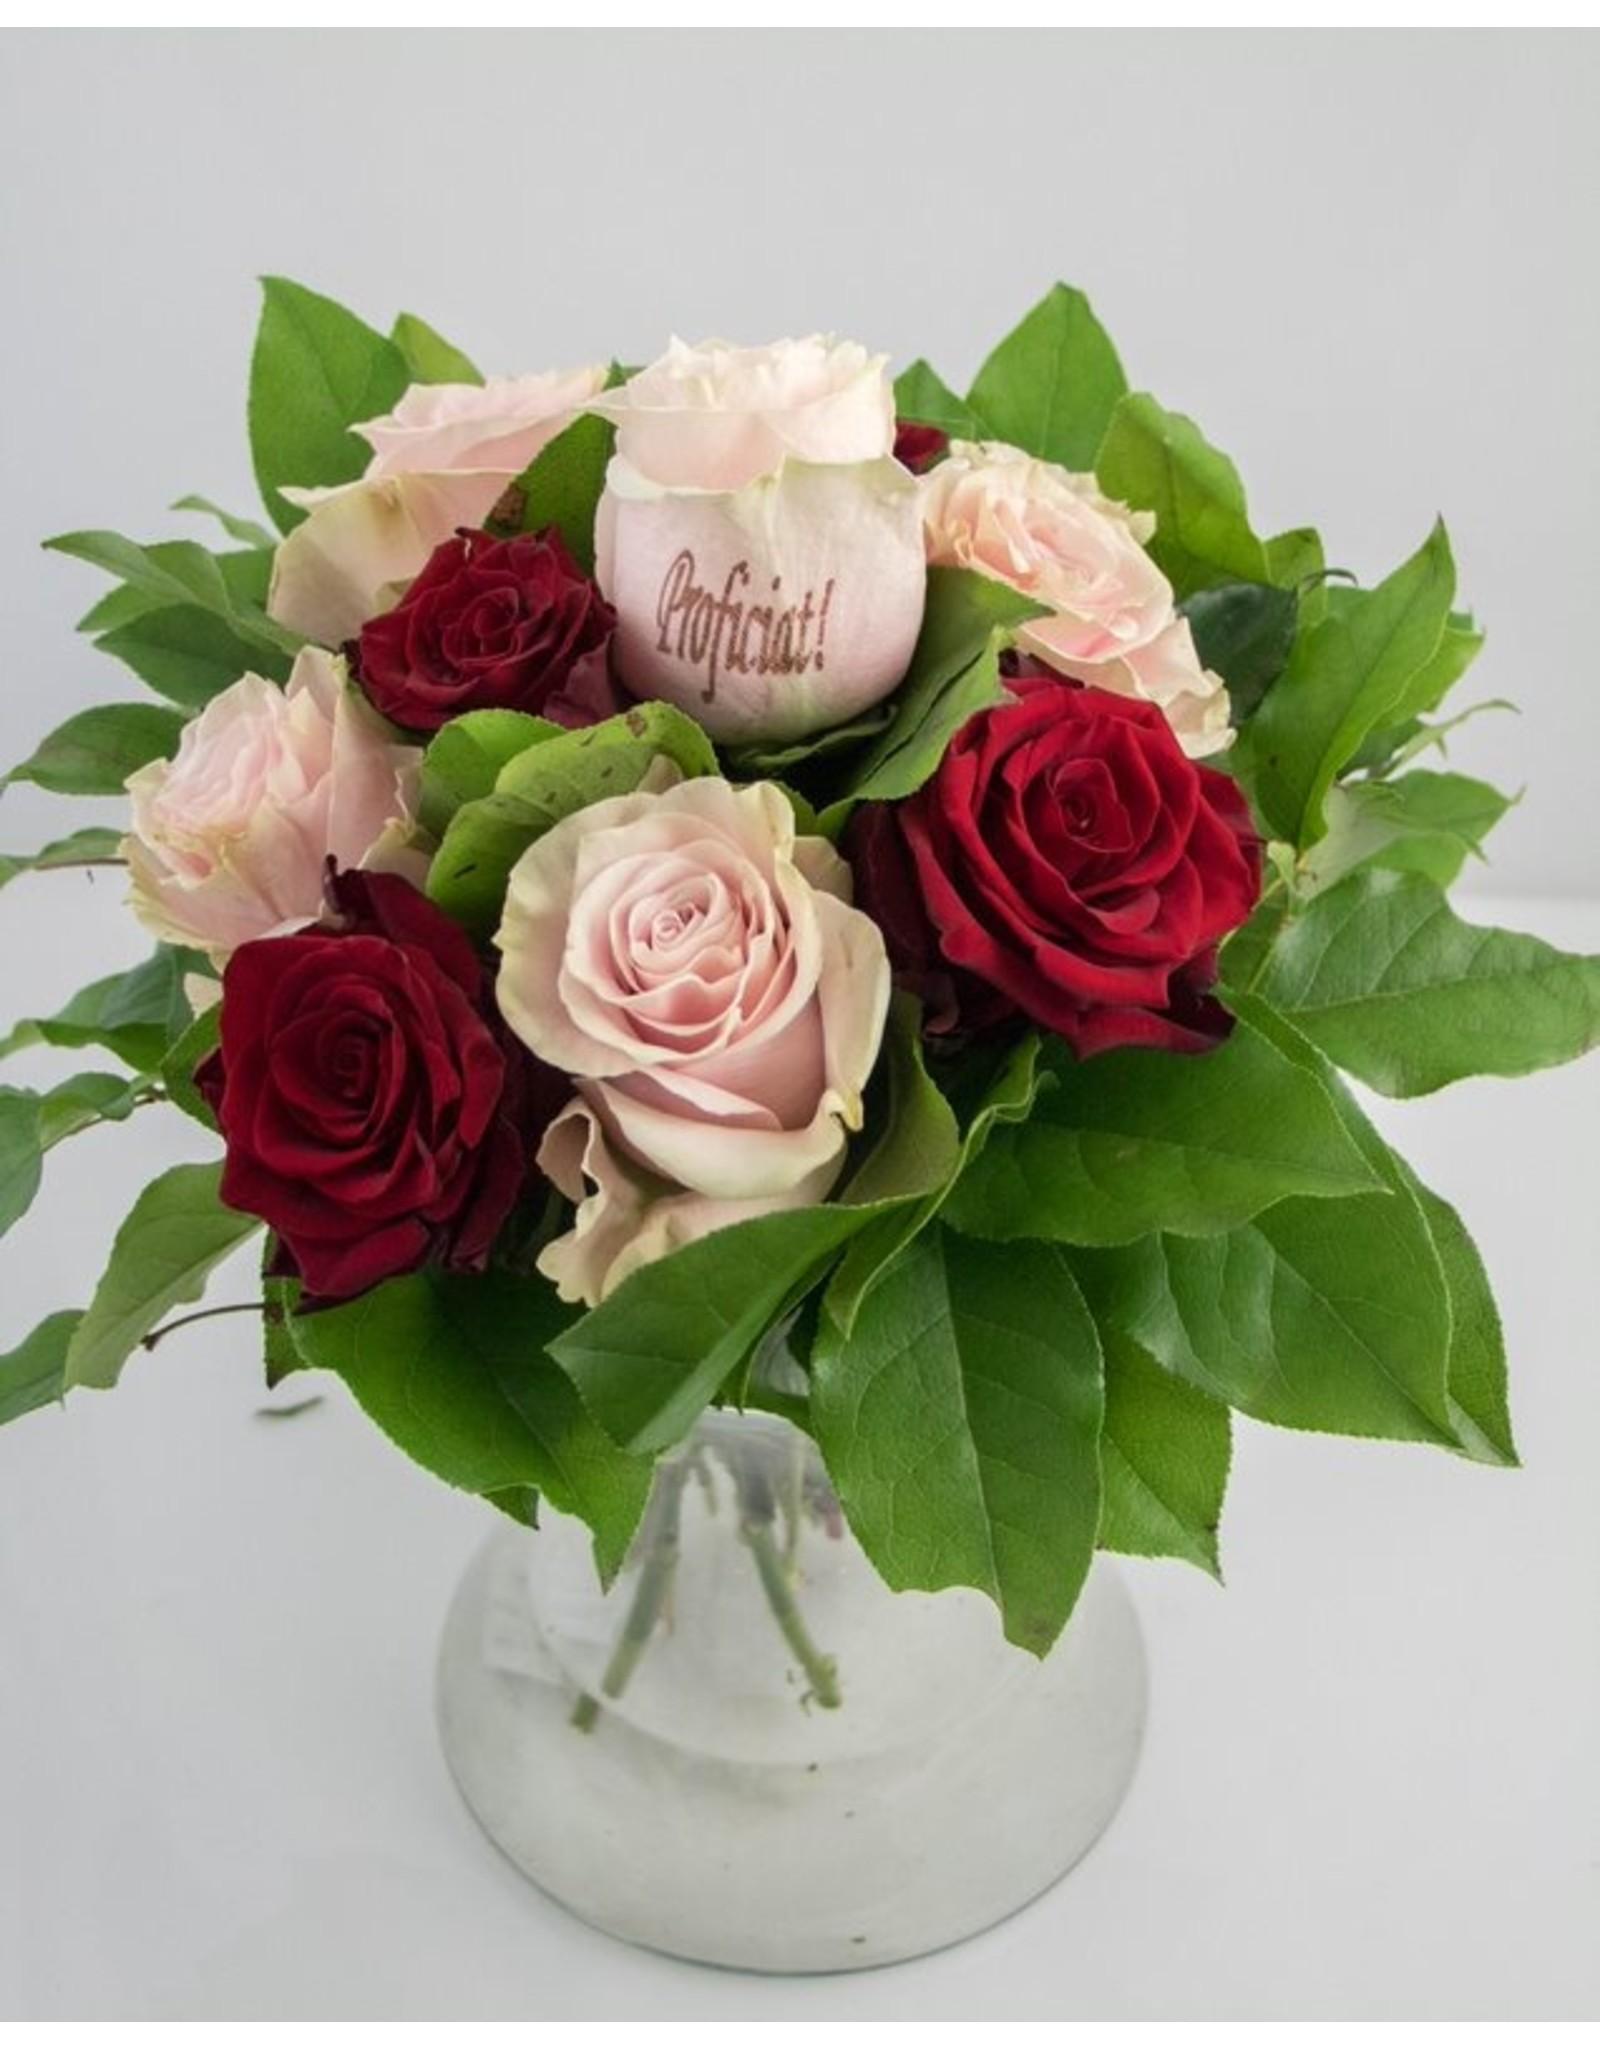 Magic Flowers Boeket 9 rozen - Rood/Roze - Proficiat